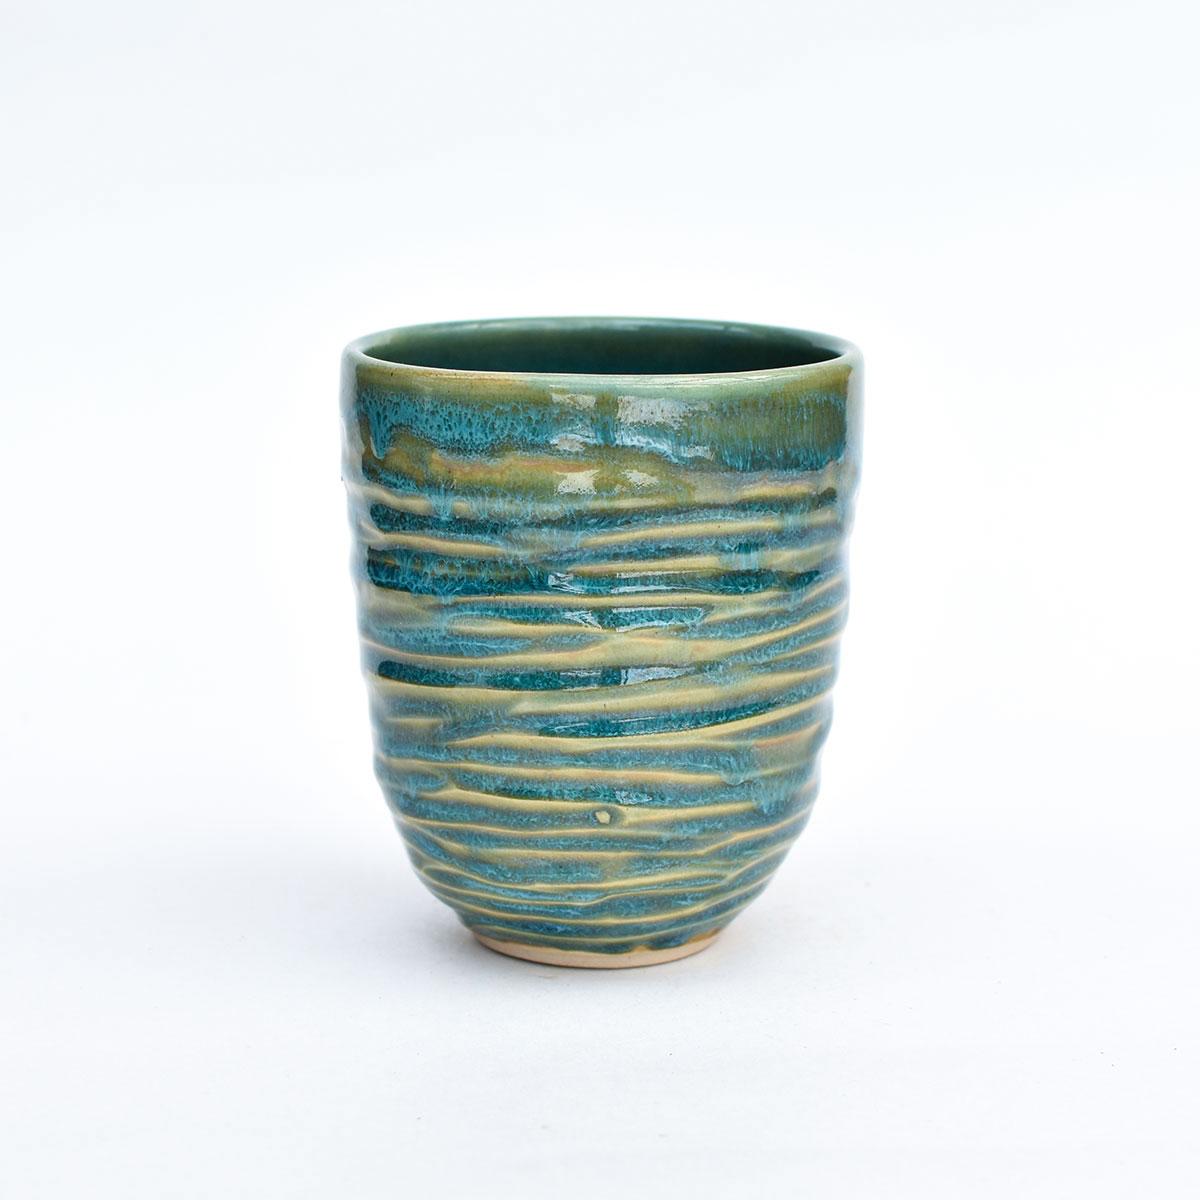 картинка Керамический стакан Натальи Астаховой 2 - DishWishes.Ru